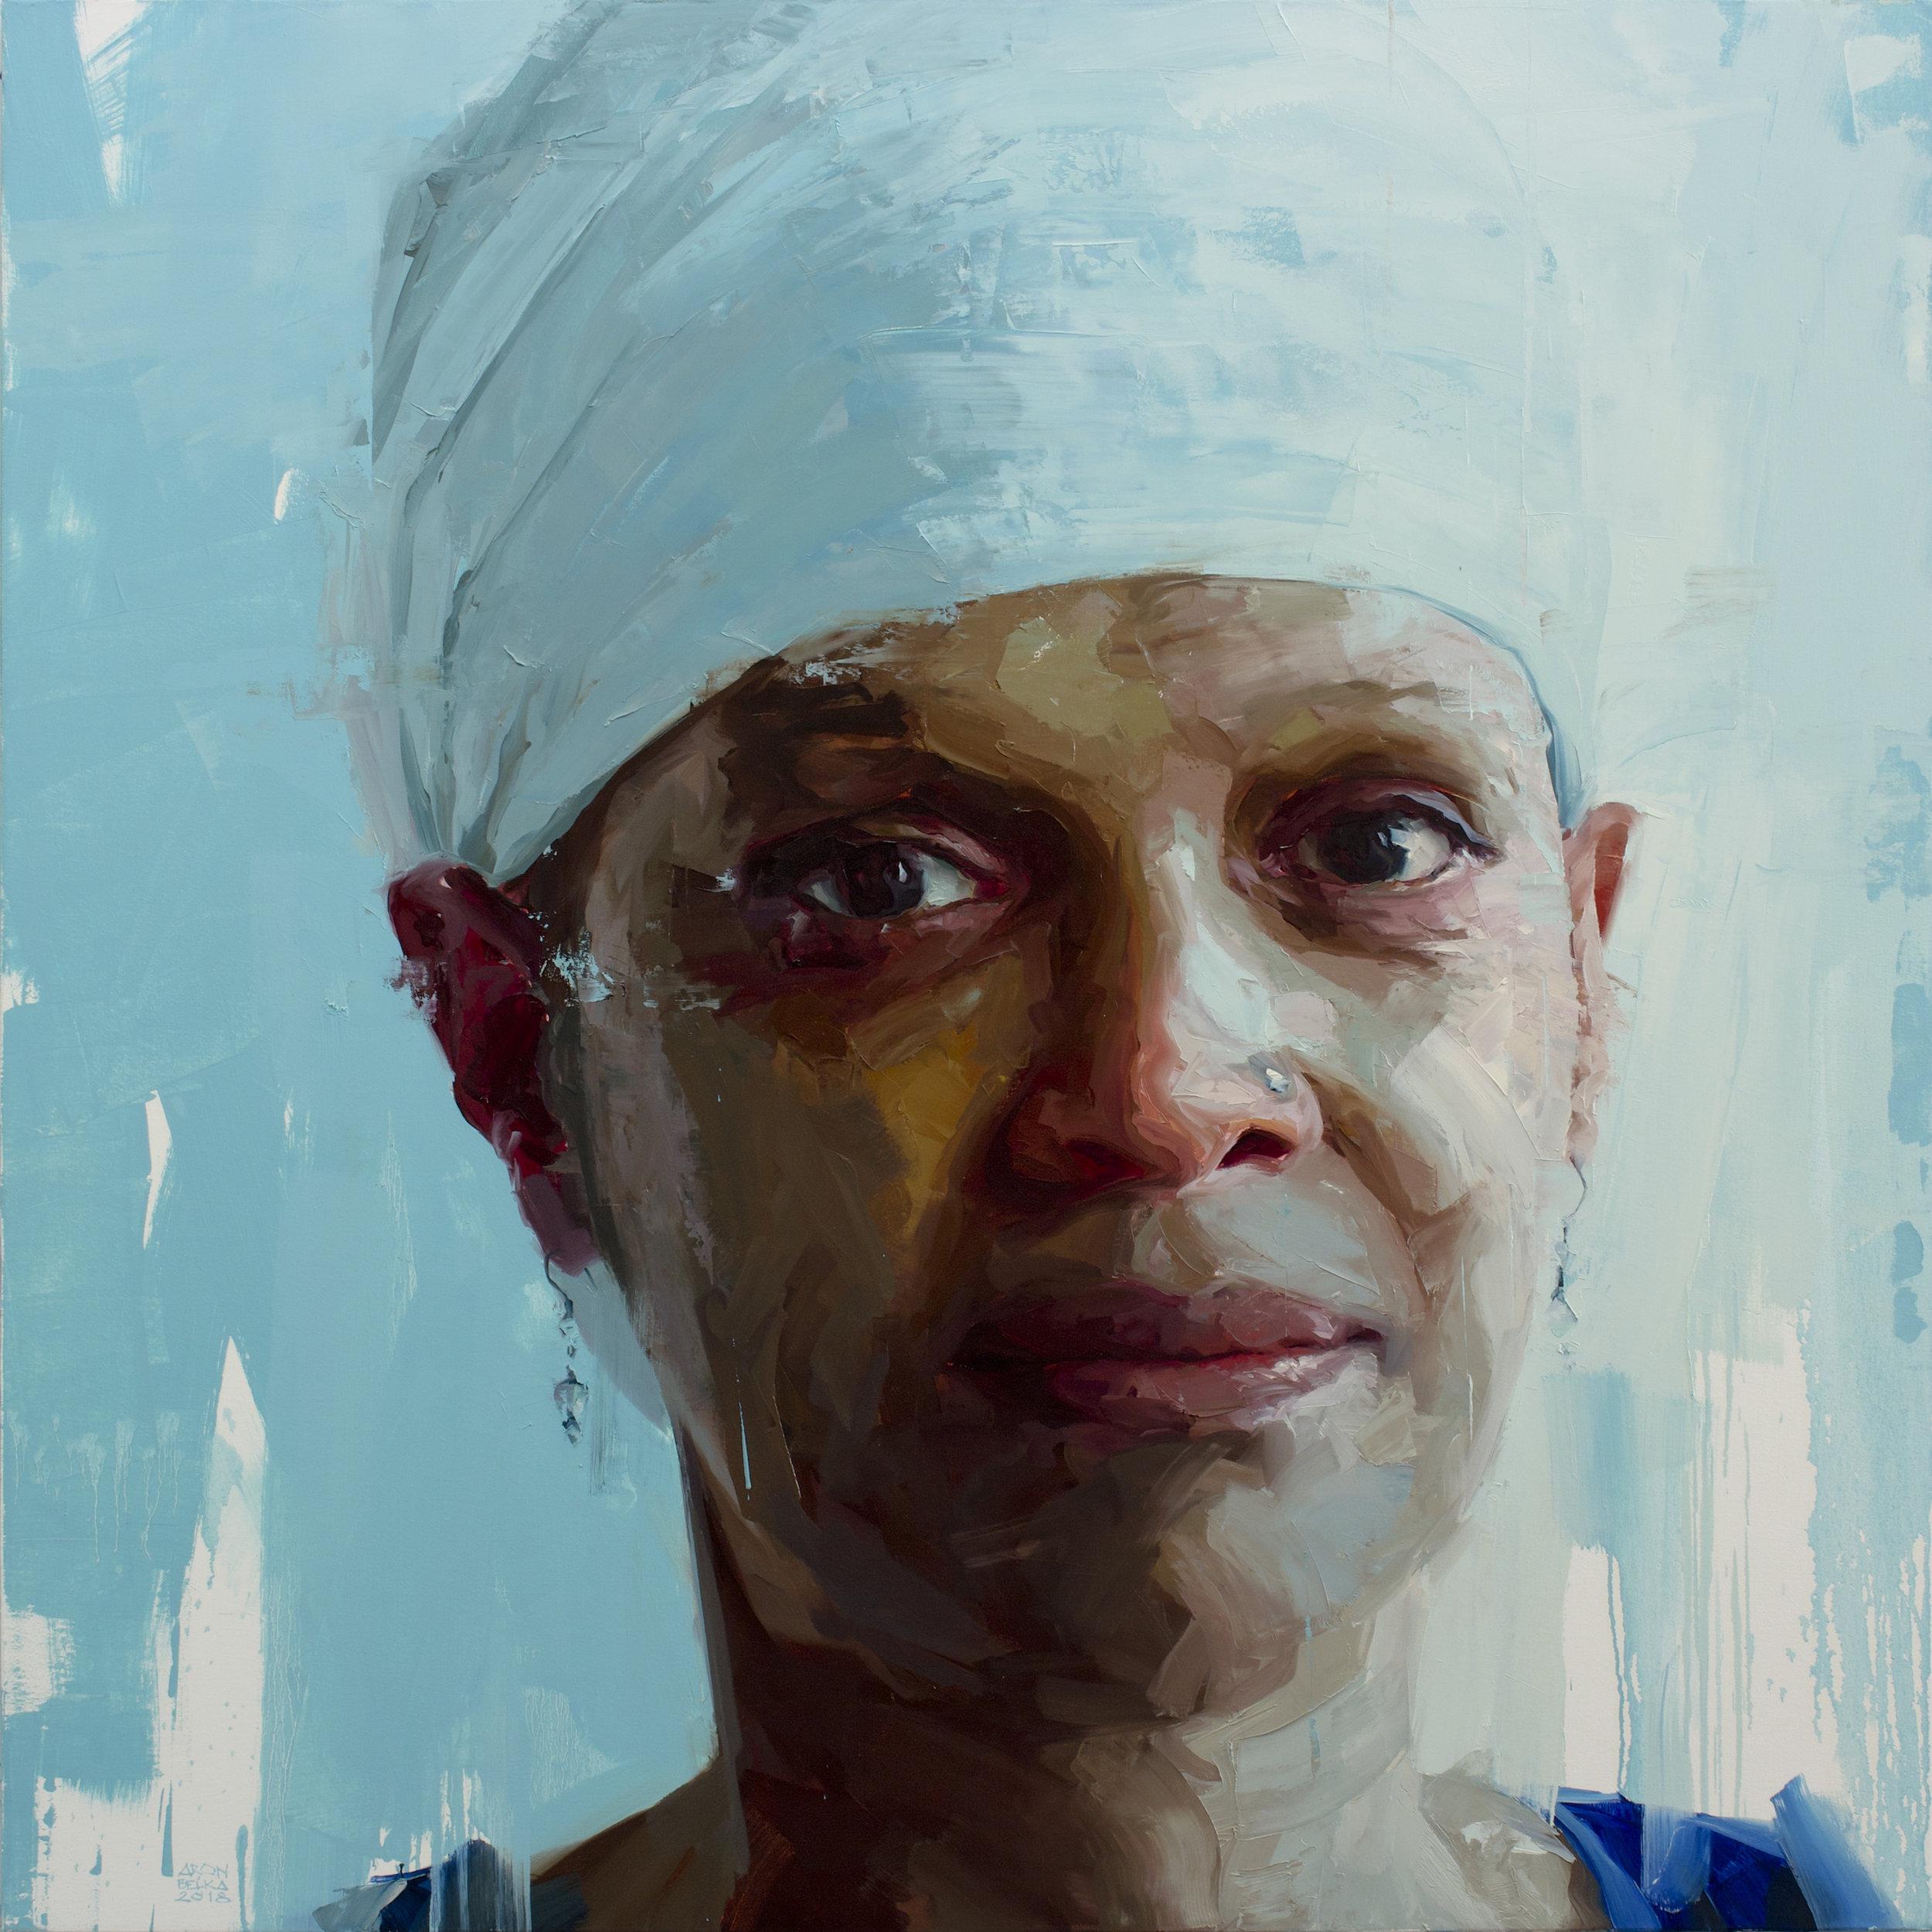 Aisha Patrice   2018 48 x 48 inches   oil on canvas